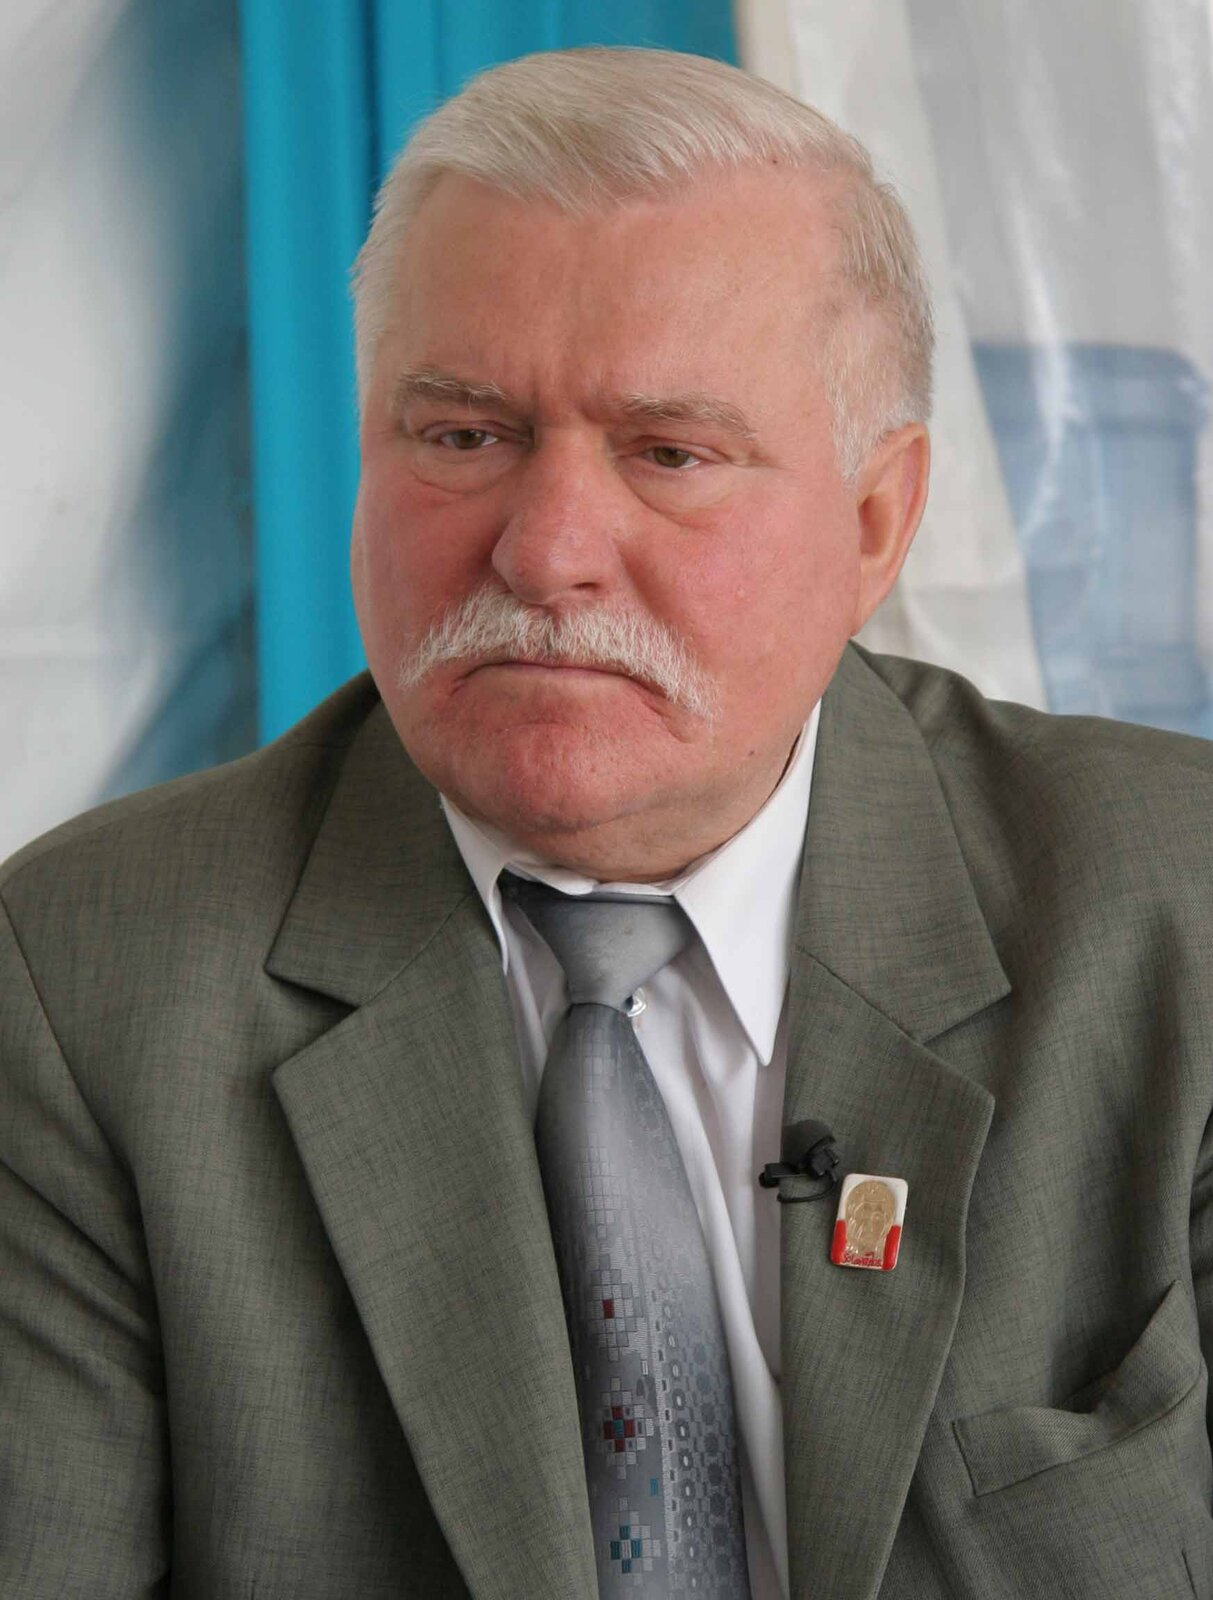 Lech Wałęsa, prezydent RP wlatach 1990–1995 Źródło: MEDEF, Lech Wałęsa, prezydent RP wlatach 1990–1995, licencja: CC BY-SA 2.0.